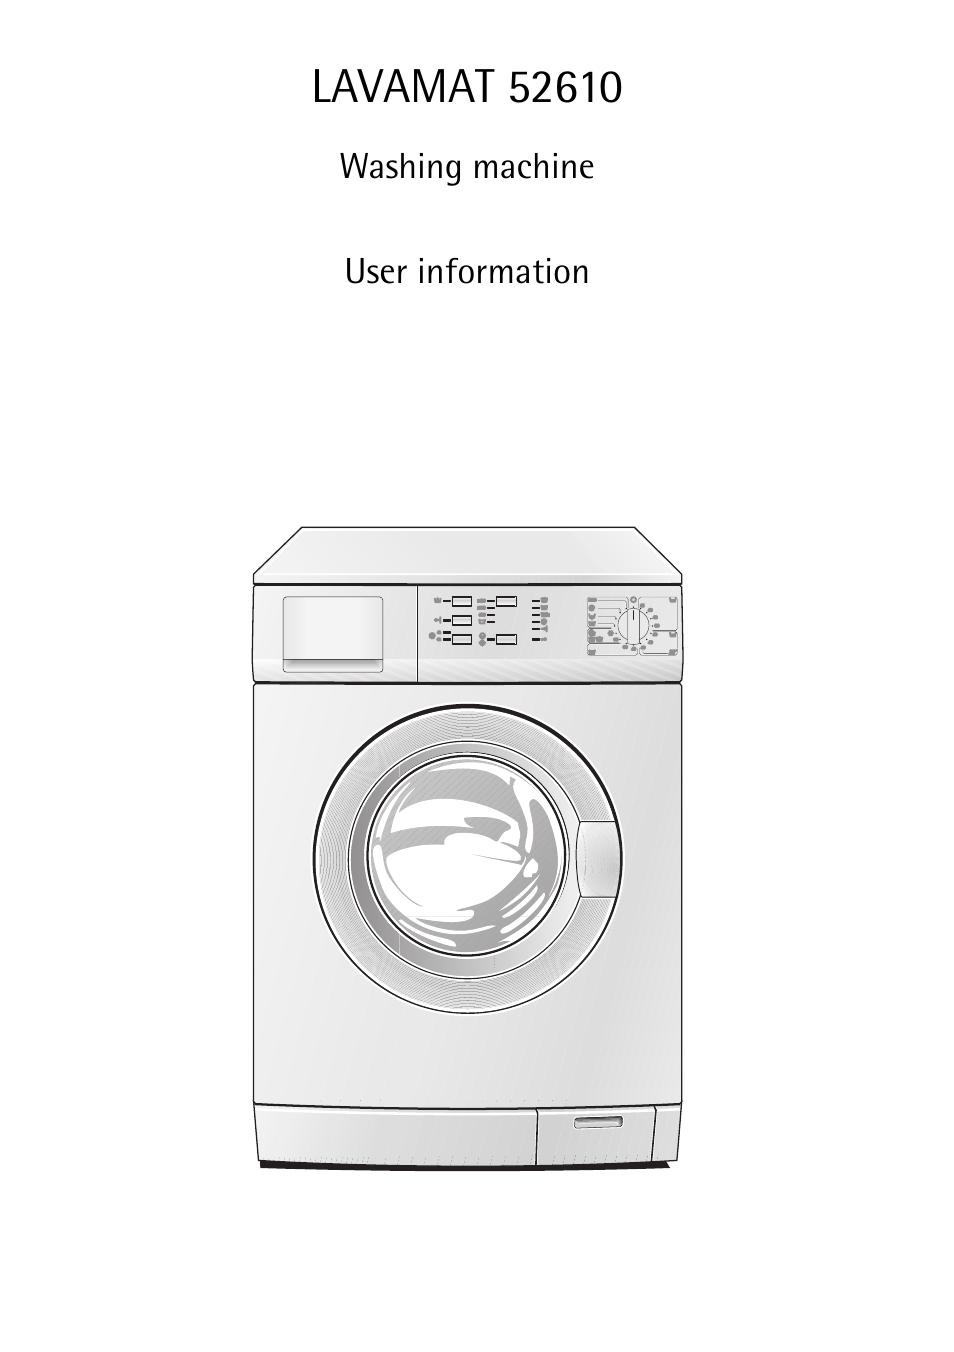 aeg lavamat 52610 user manual 40 pages. Black Bedroom Furniture Sets. Home Design Ideas